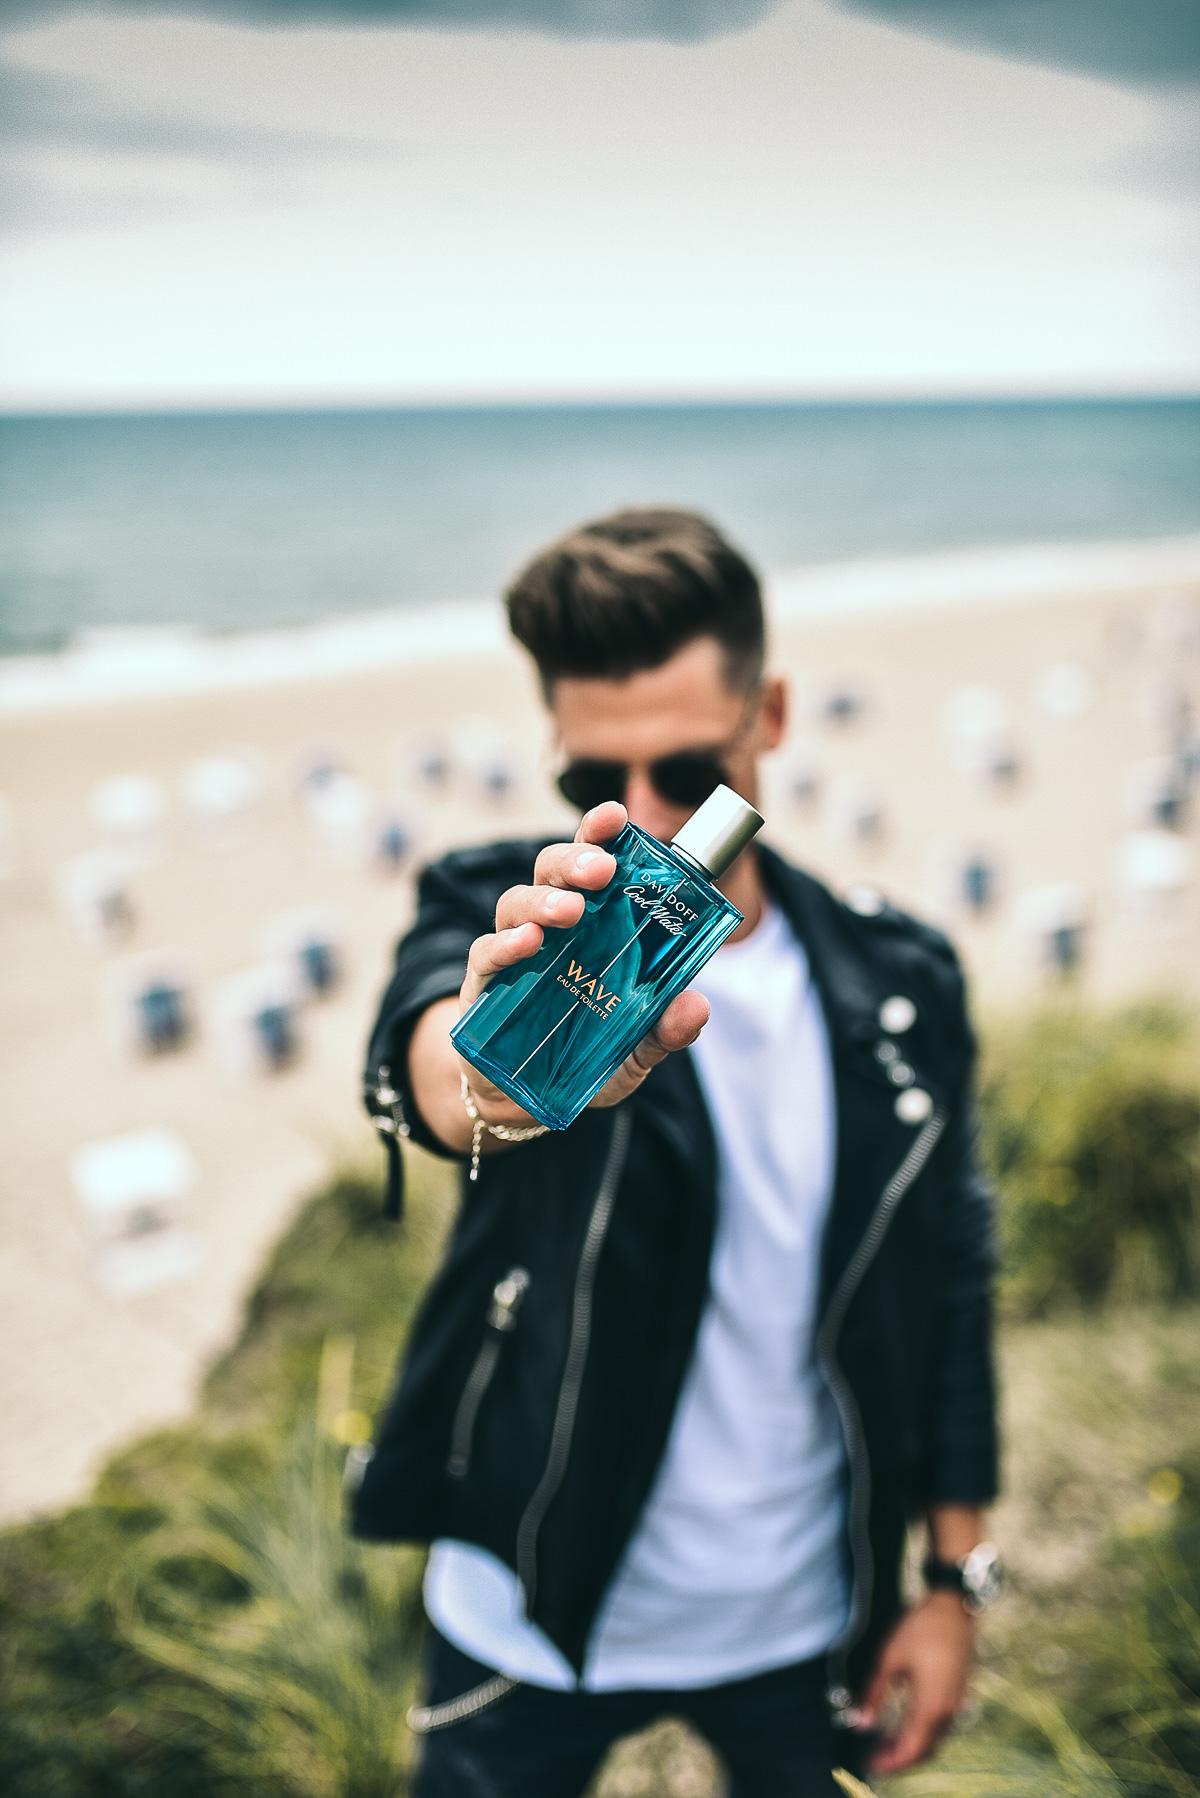 Tommeezjerry-Maennermodeblog-Maennermode-Fashionblog-Styleblog-Lifestyleblog-Davidoff-Cool-Water-Wave-Sylt-Surfing-Frloian-Jung-Wassersport-Fragrance